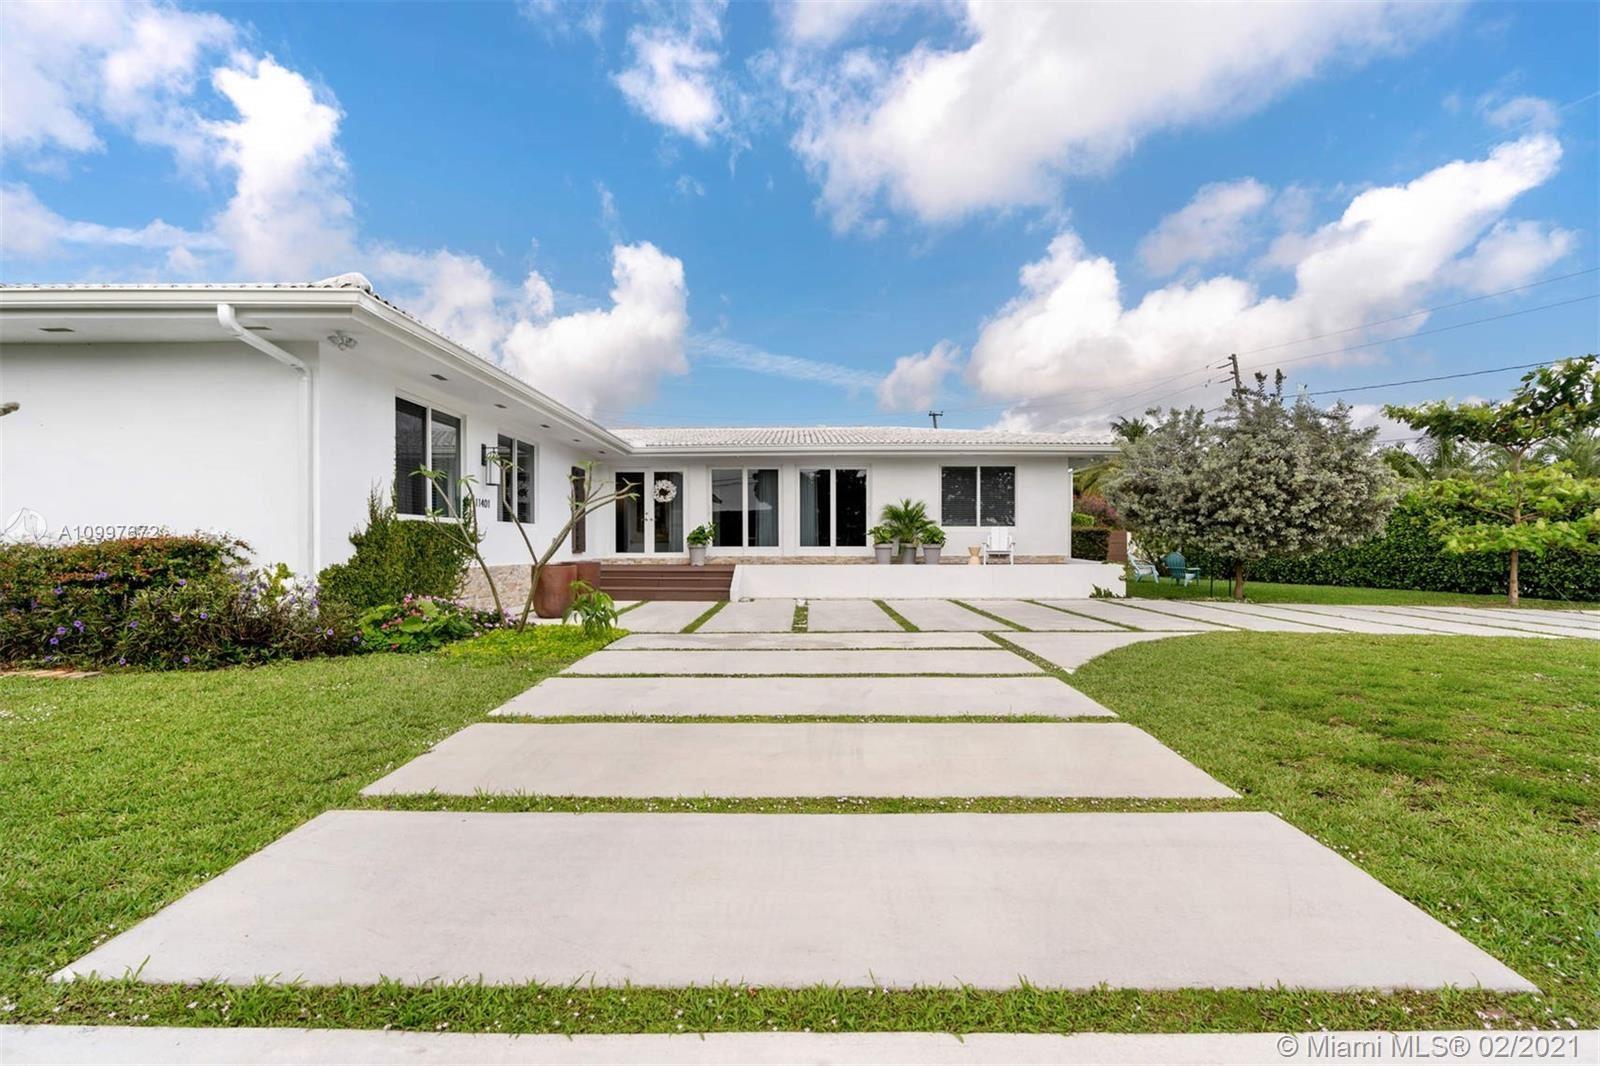 Photo of 11401 N Bayshore Dr, North Miami, FL 33181 (MLS # A10997672)